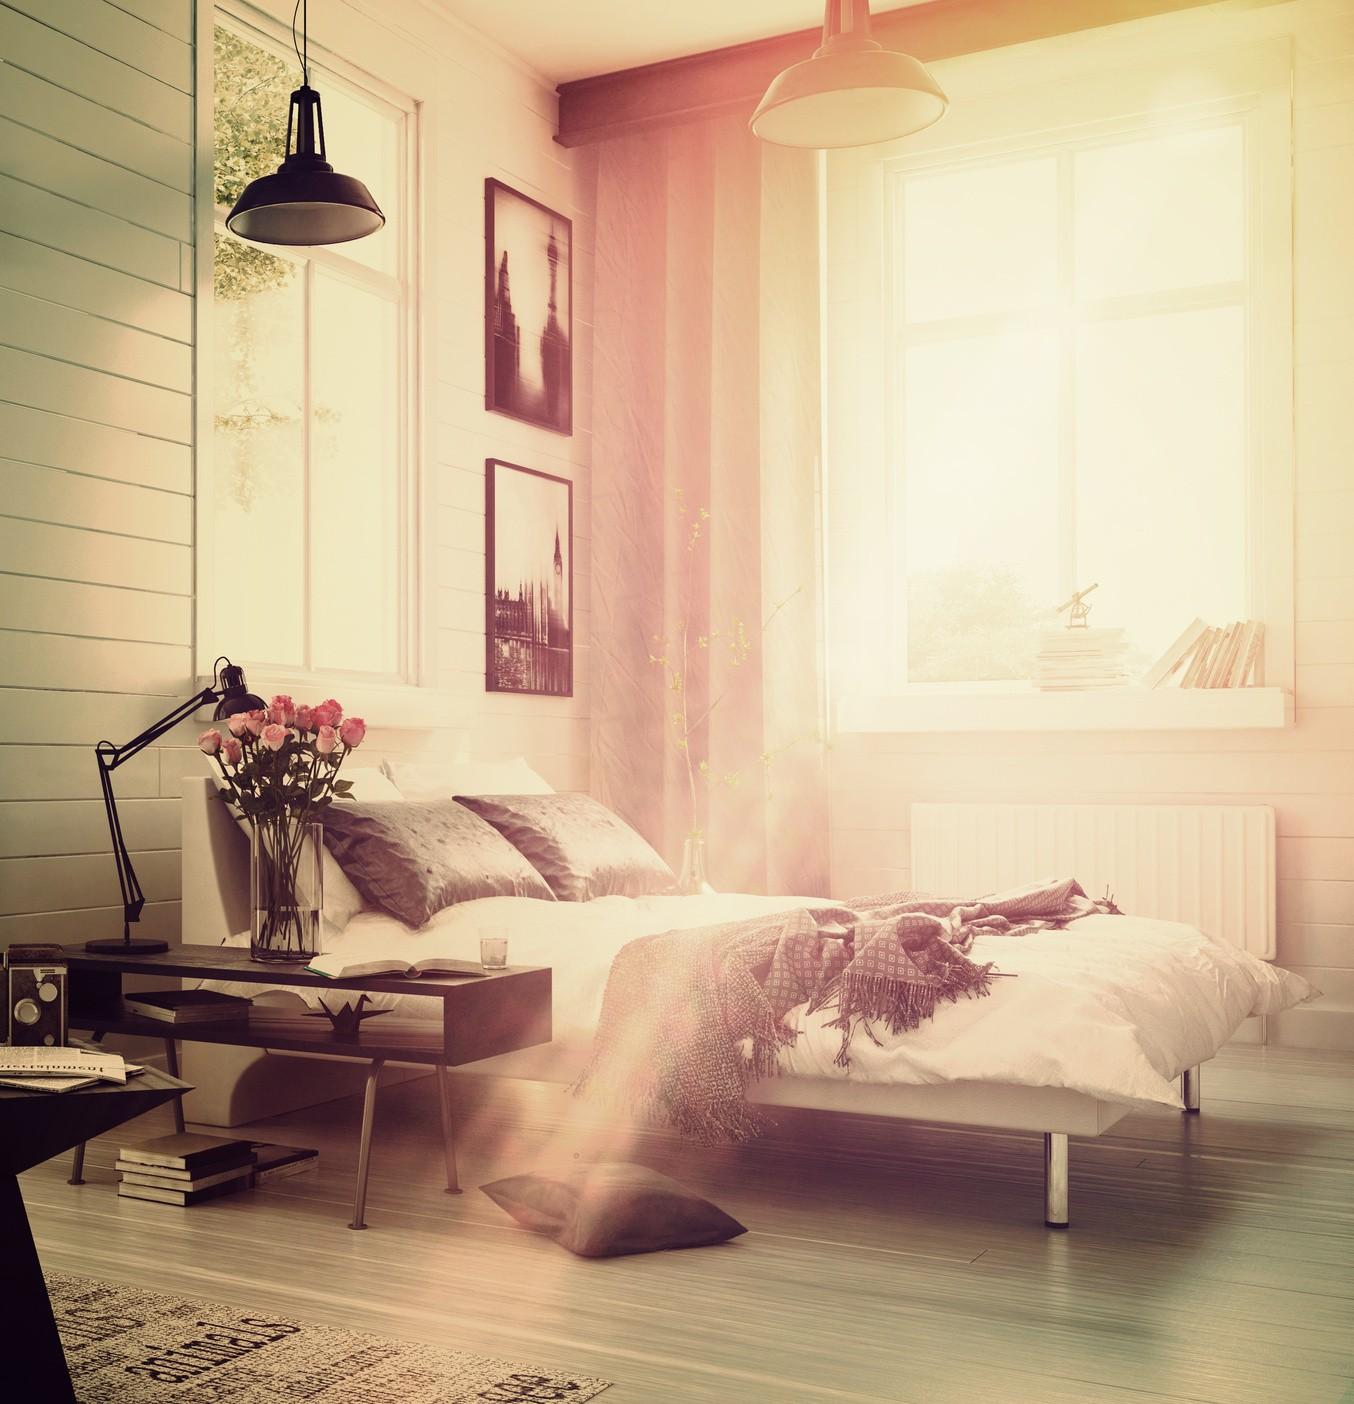 Kolory Do Sypialni Feng Shui Na Jakie Postawić I Jak